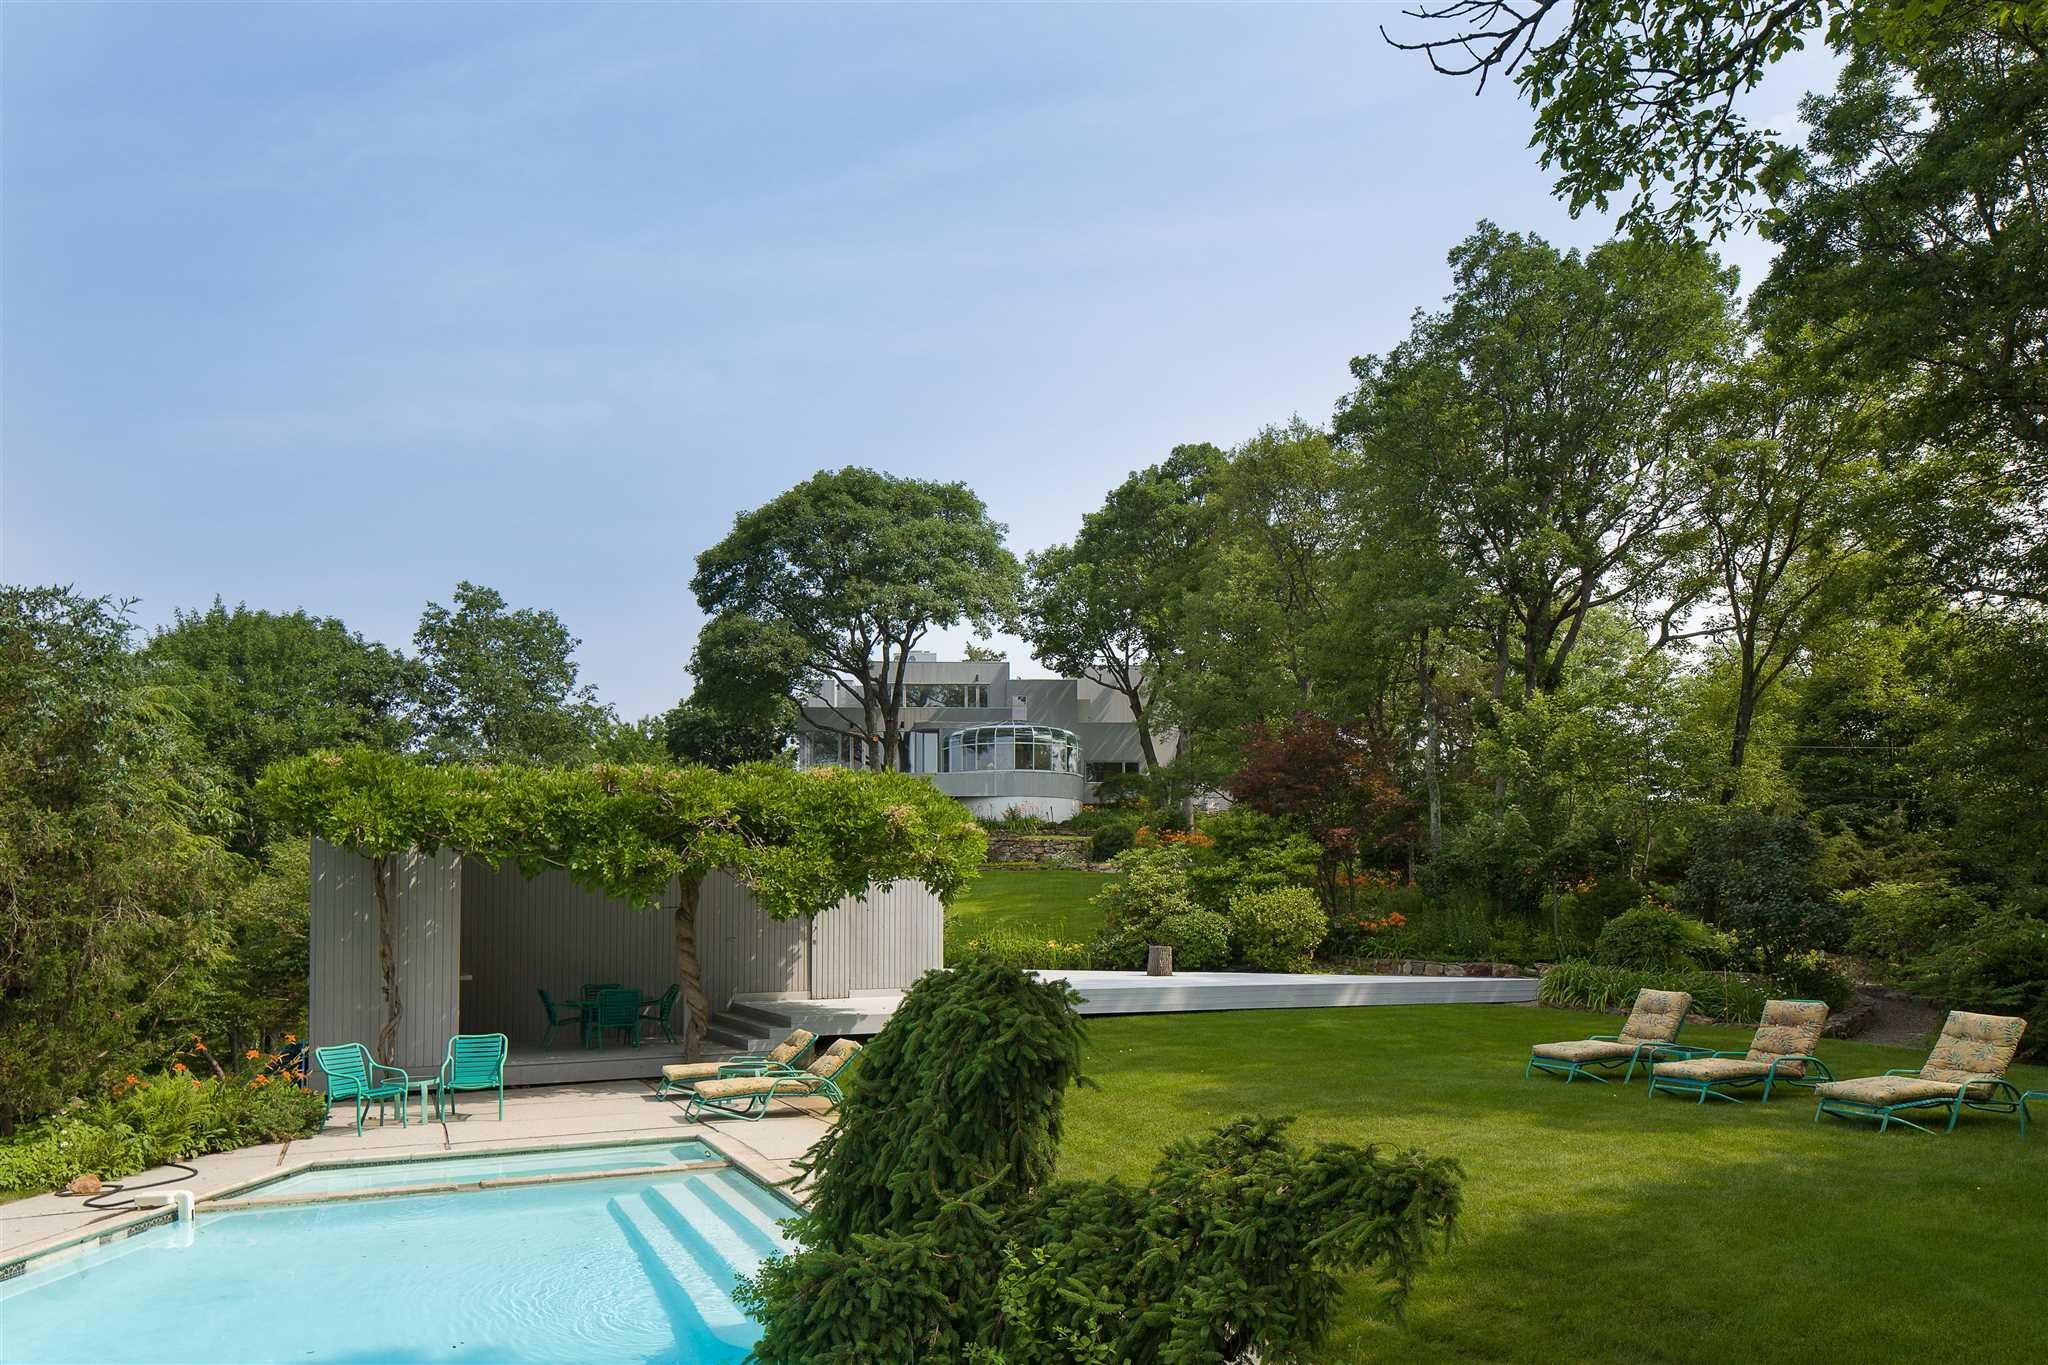 Single Family Home for Sale at 21 ARAS RIDGE 21 ARAS RIDGE Philipstown, New York 10524 United States